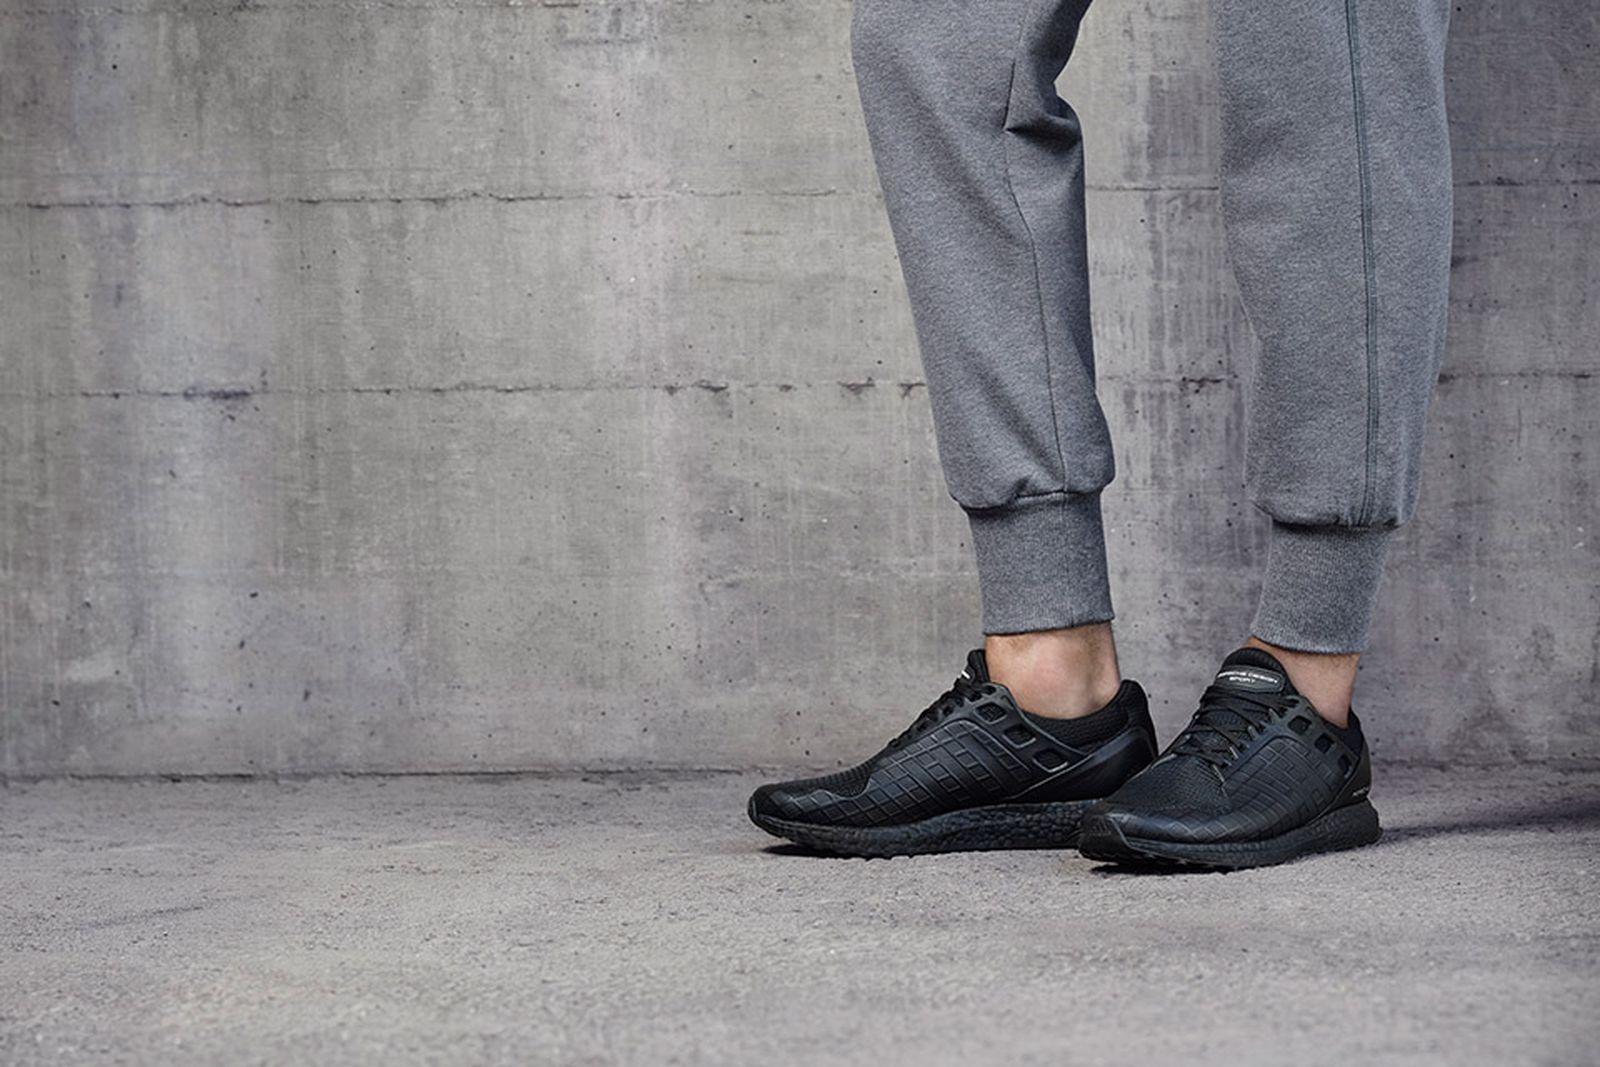 porsche-design-sport-adidas-ultra-boost-black-05